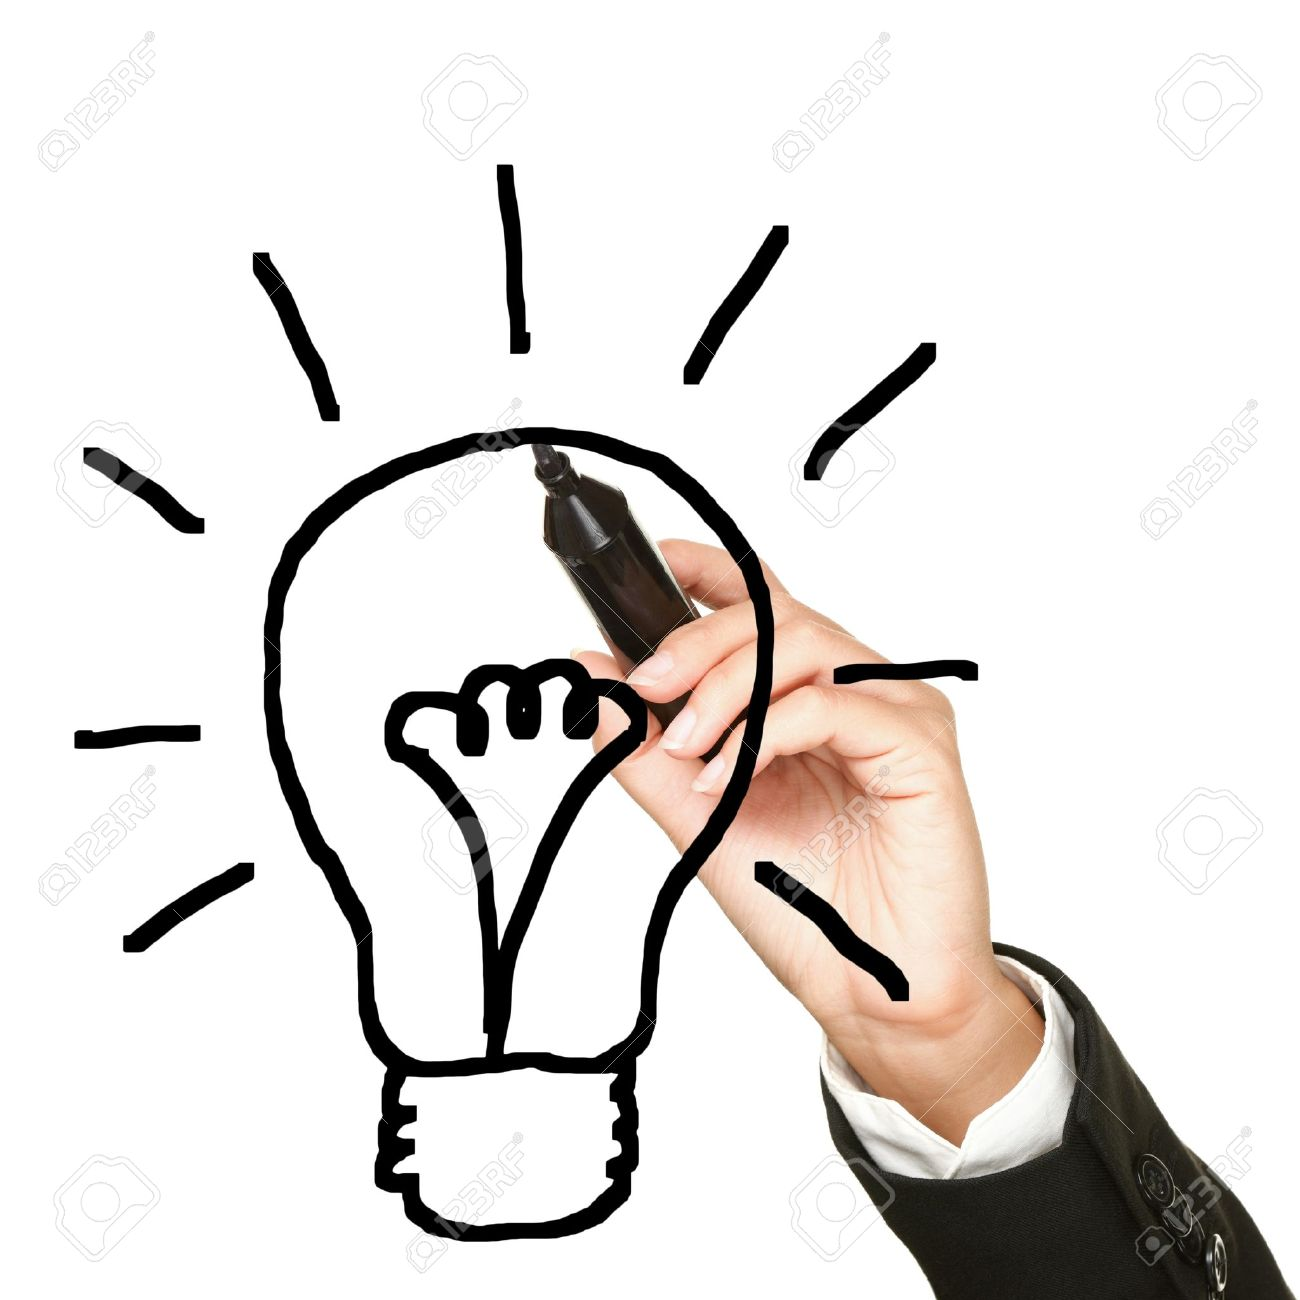 1300x1300 Light Bulb Idea Drawing Business Concept. Business Innovation